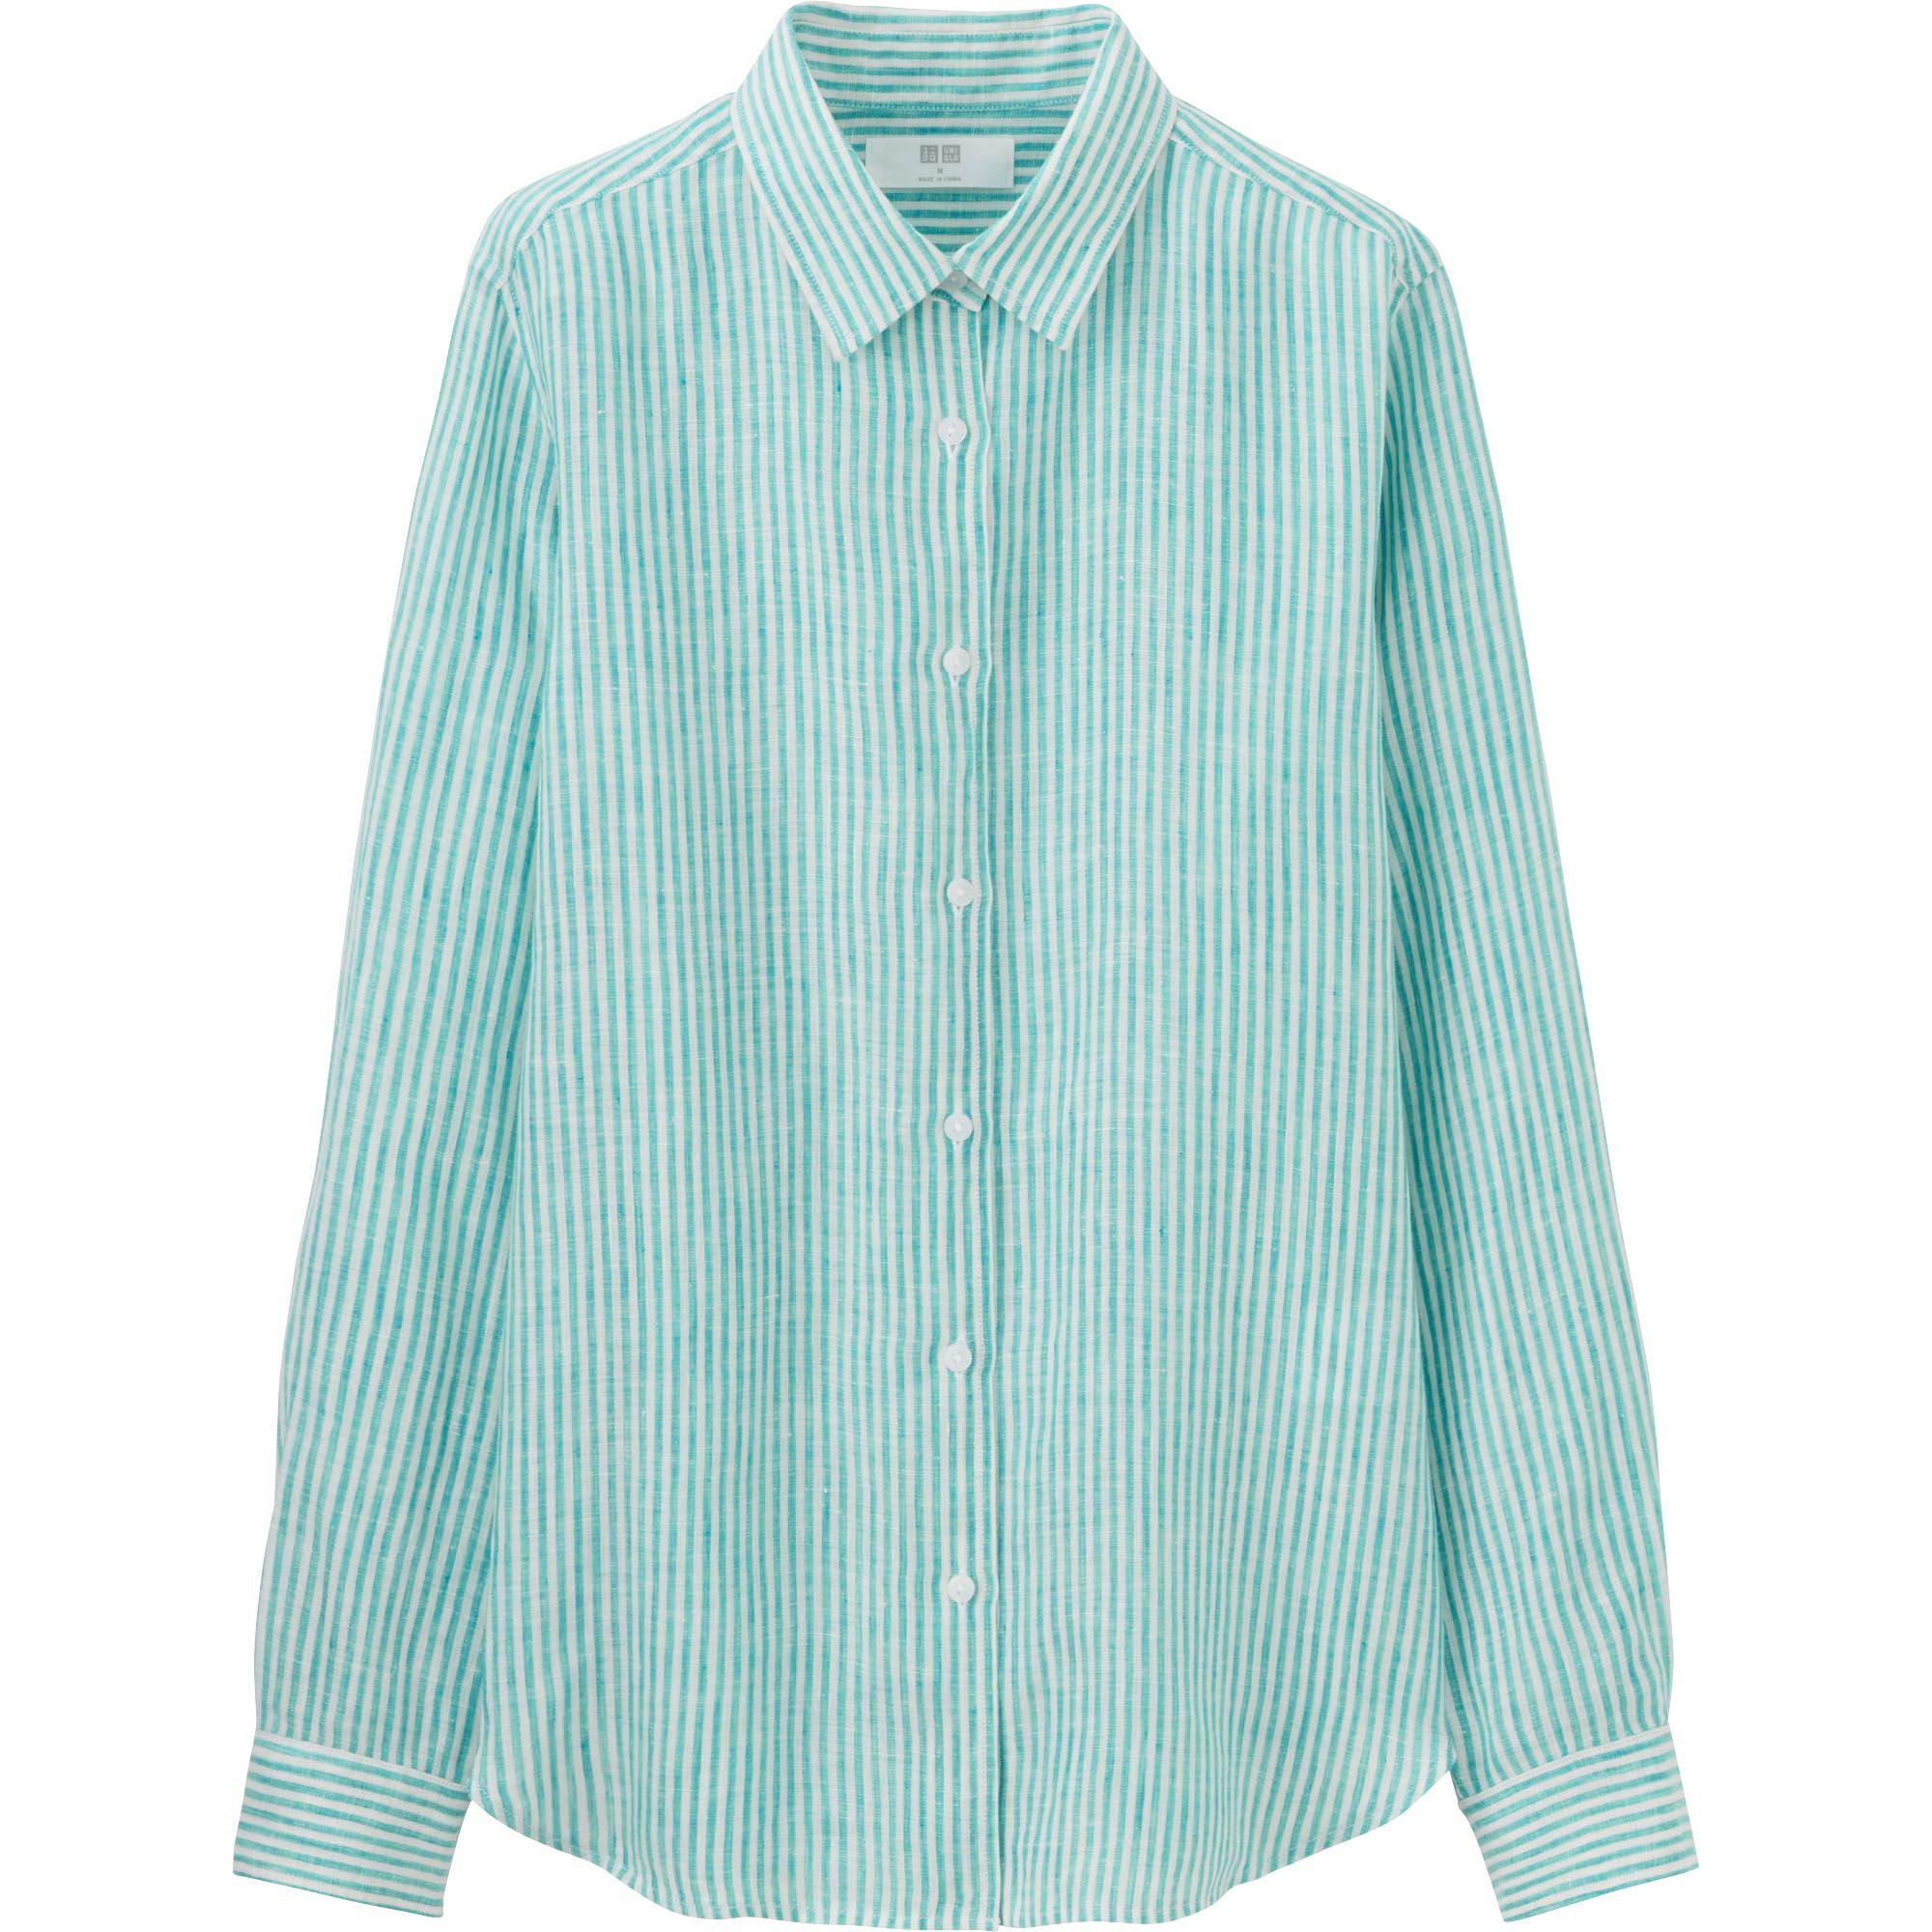 Uniqlo Women 39 S Premium Linen Patterned Long Sleeve Shirt